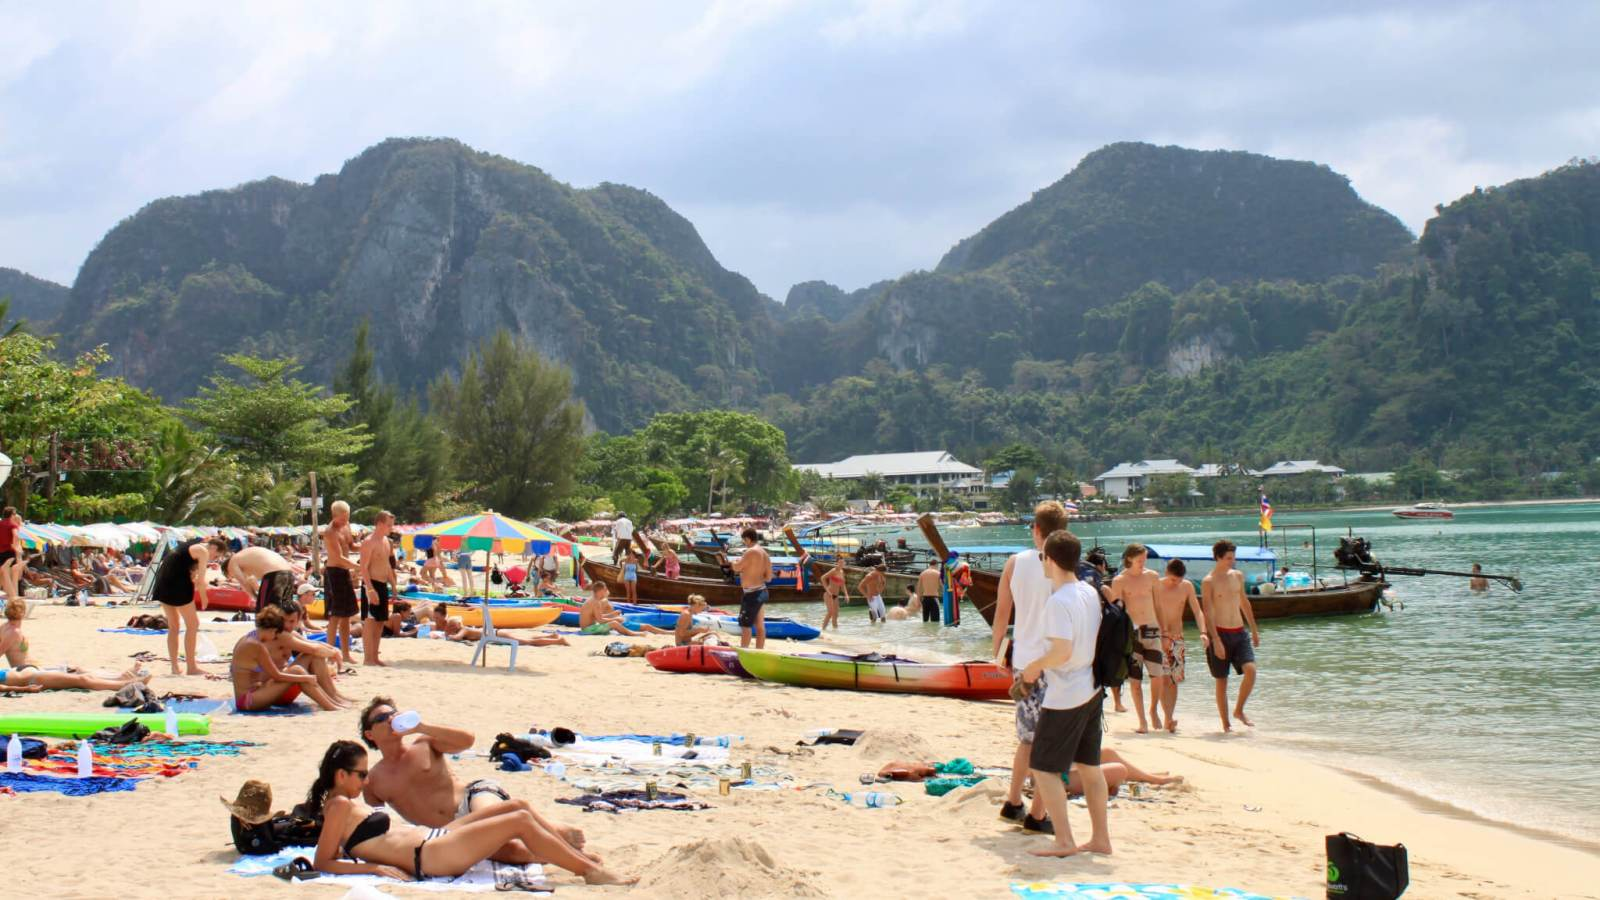 Crowded beach at Koh Phi Phi